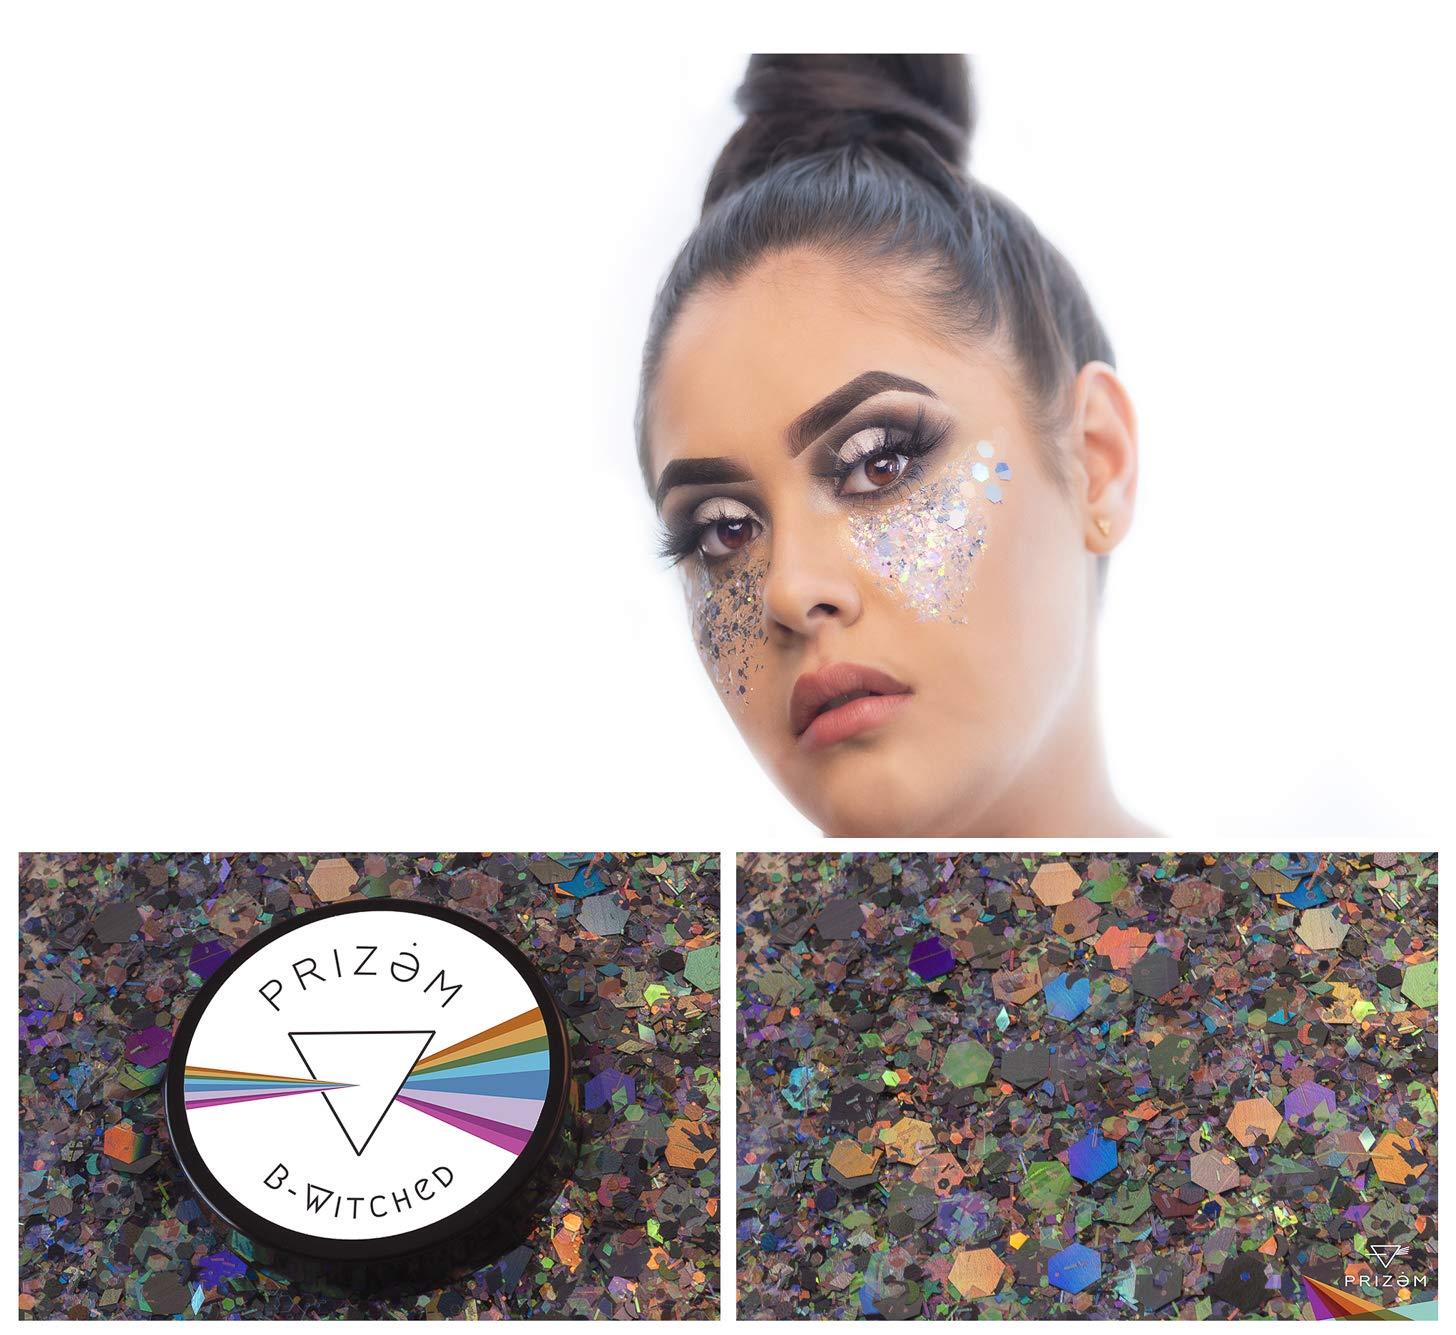 Prizem B-Witched Glitter ▽ 60g ▽ Festival Glitter , Chunky Glitter , Makeup Glitter , Face Glitter , Body Glitter , Glitter Makeup , Hair Glitter , Cosmetic Glitter , Nail Glitter , Eyeshadow Glitter